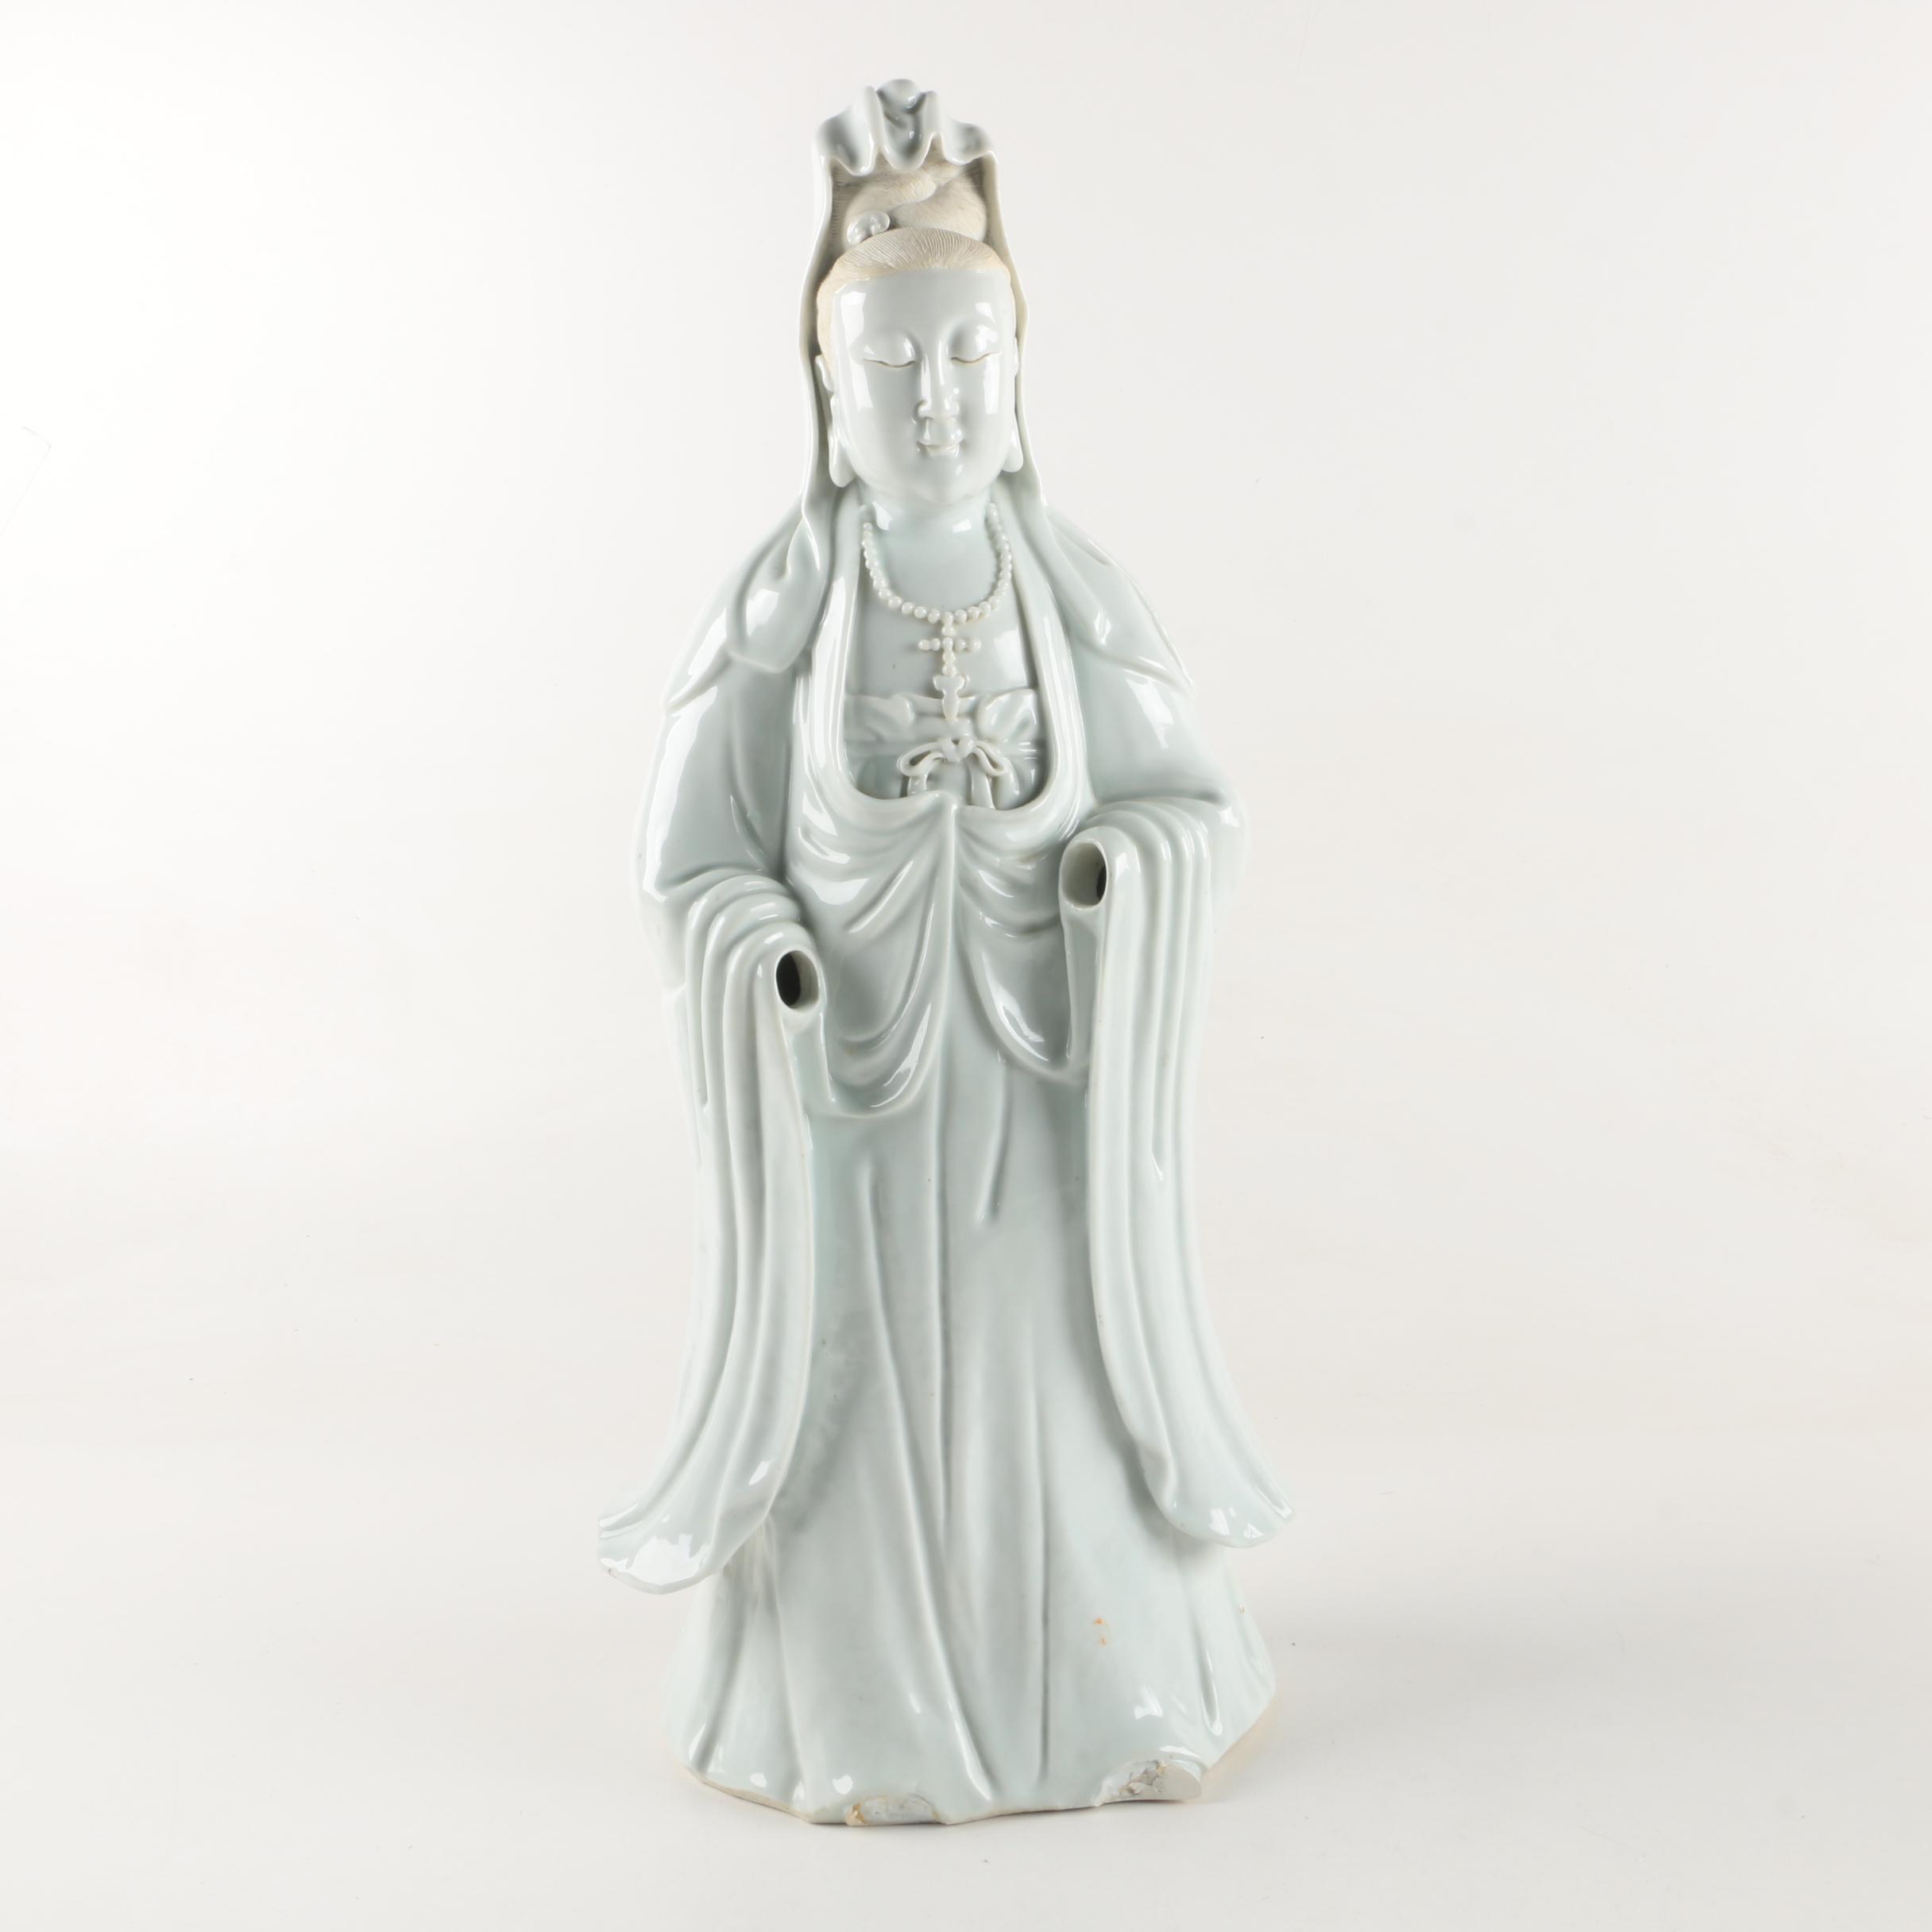 Chinese Porcelain Guanyin Figurine